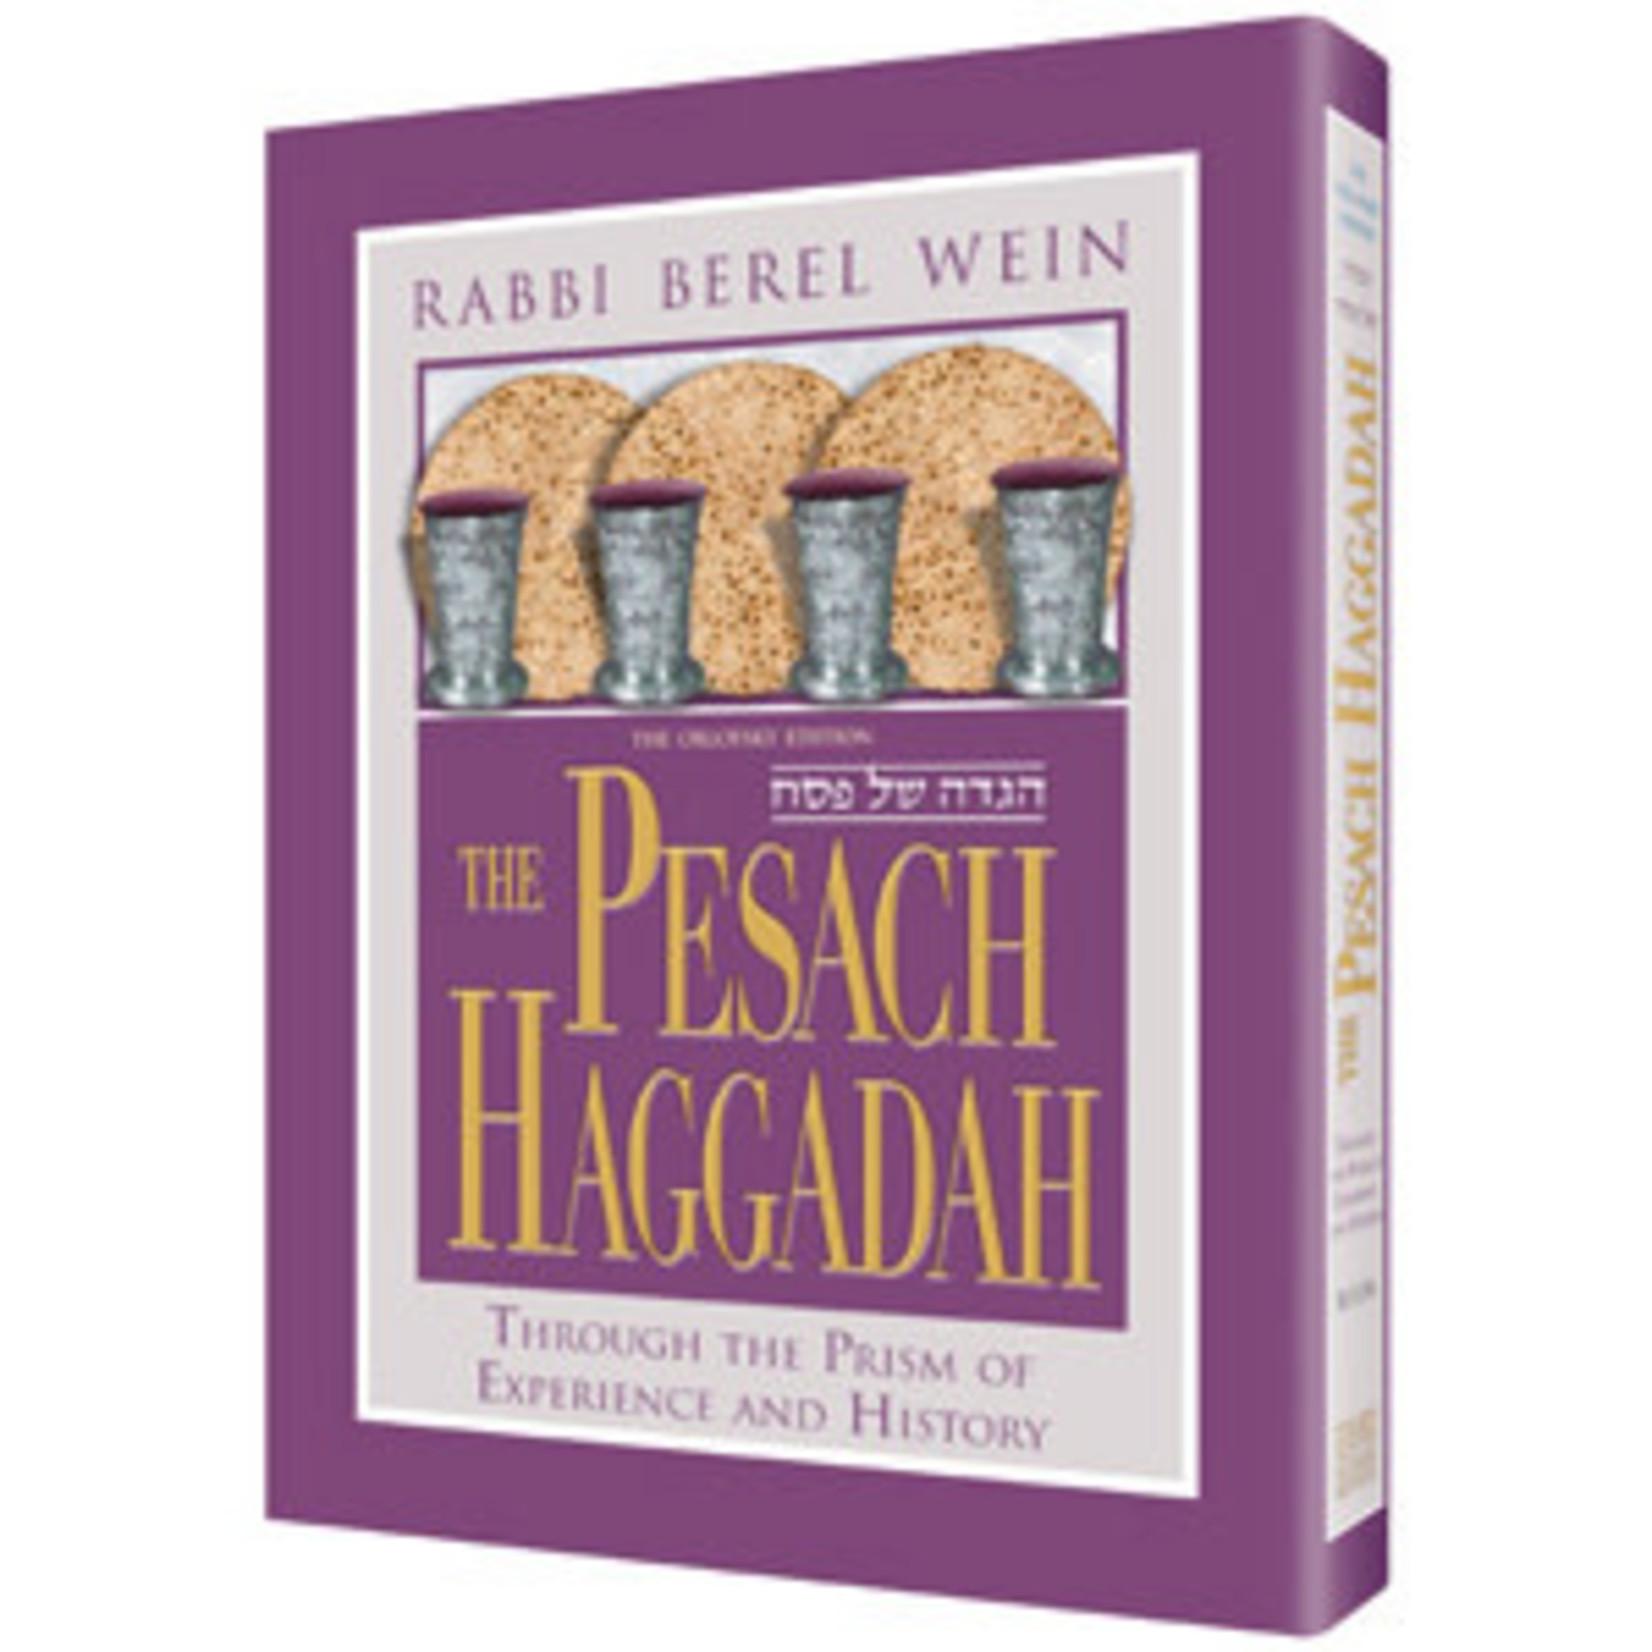 Rabbi Wein Haggadah, Gift Edition